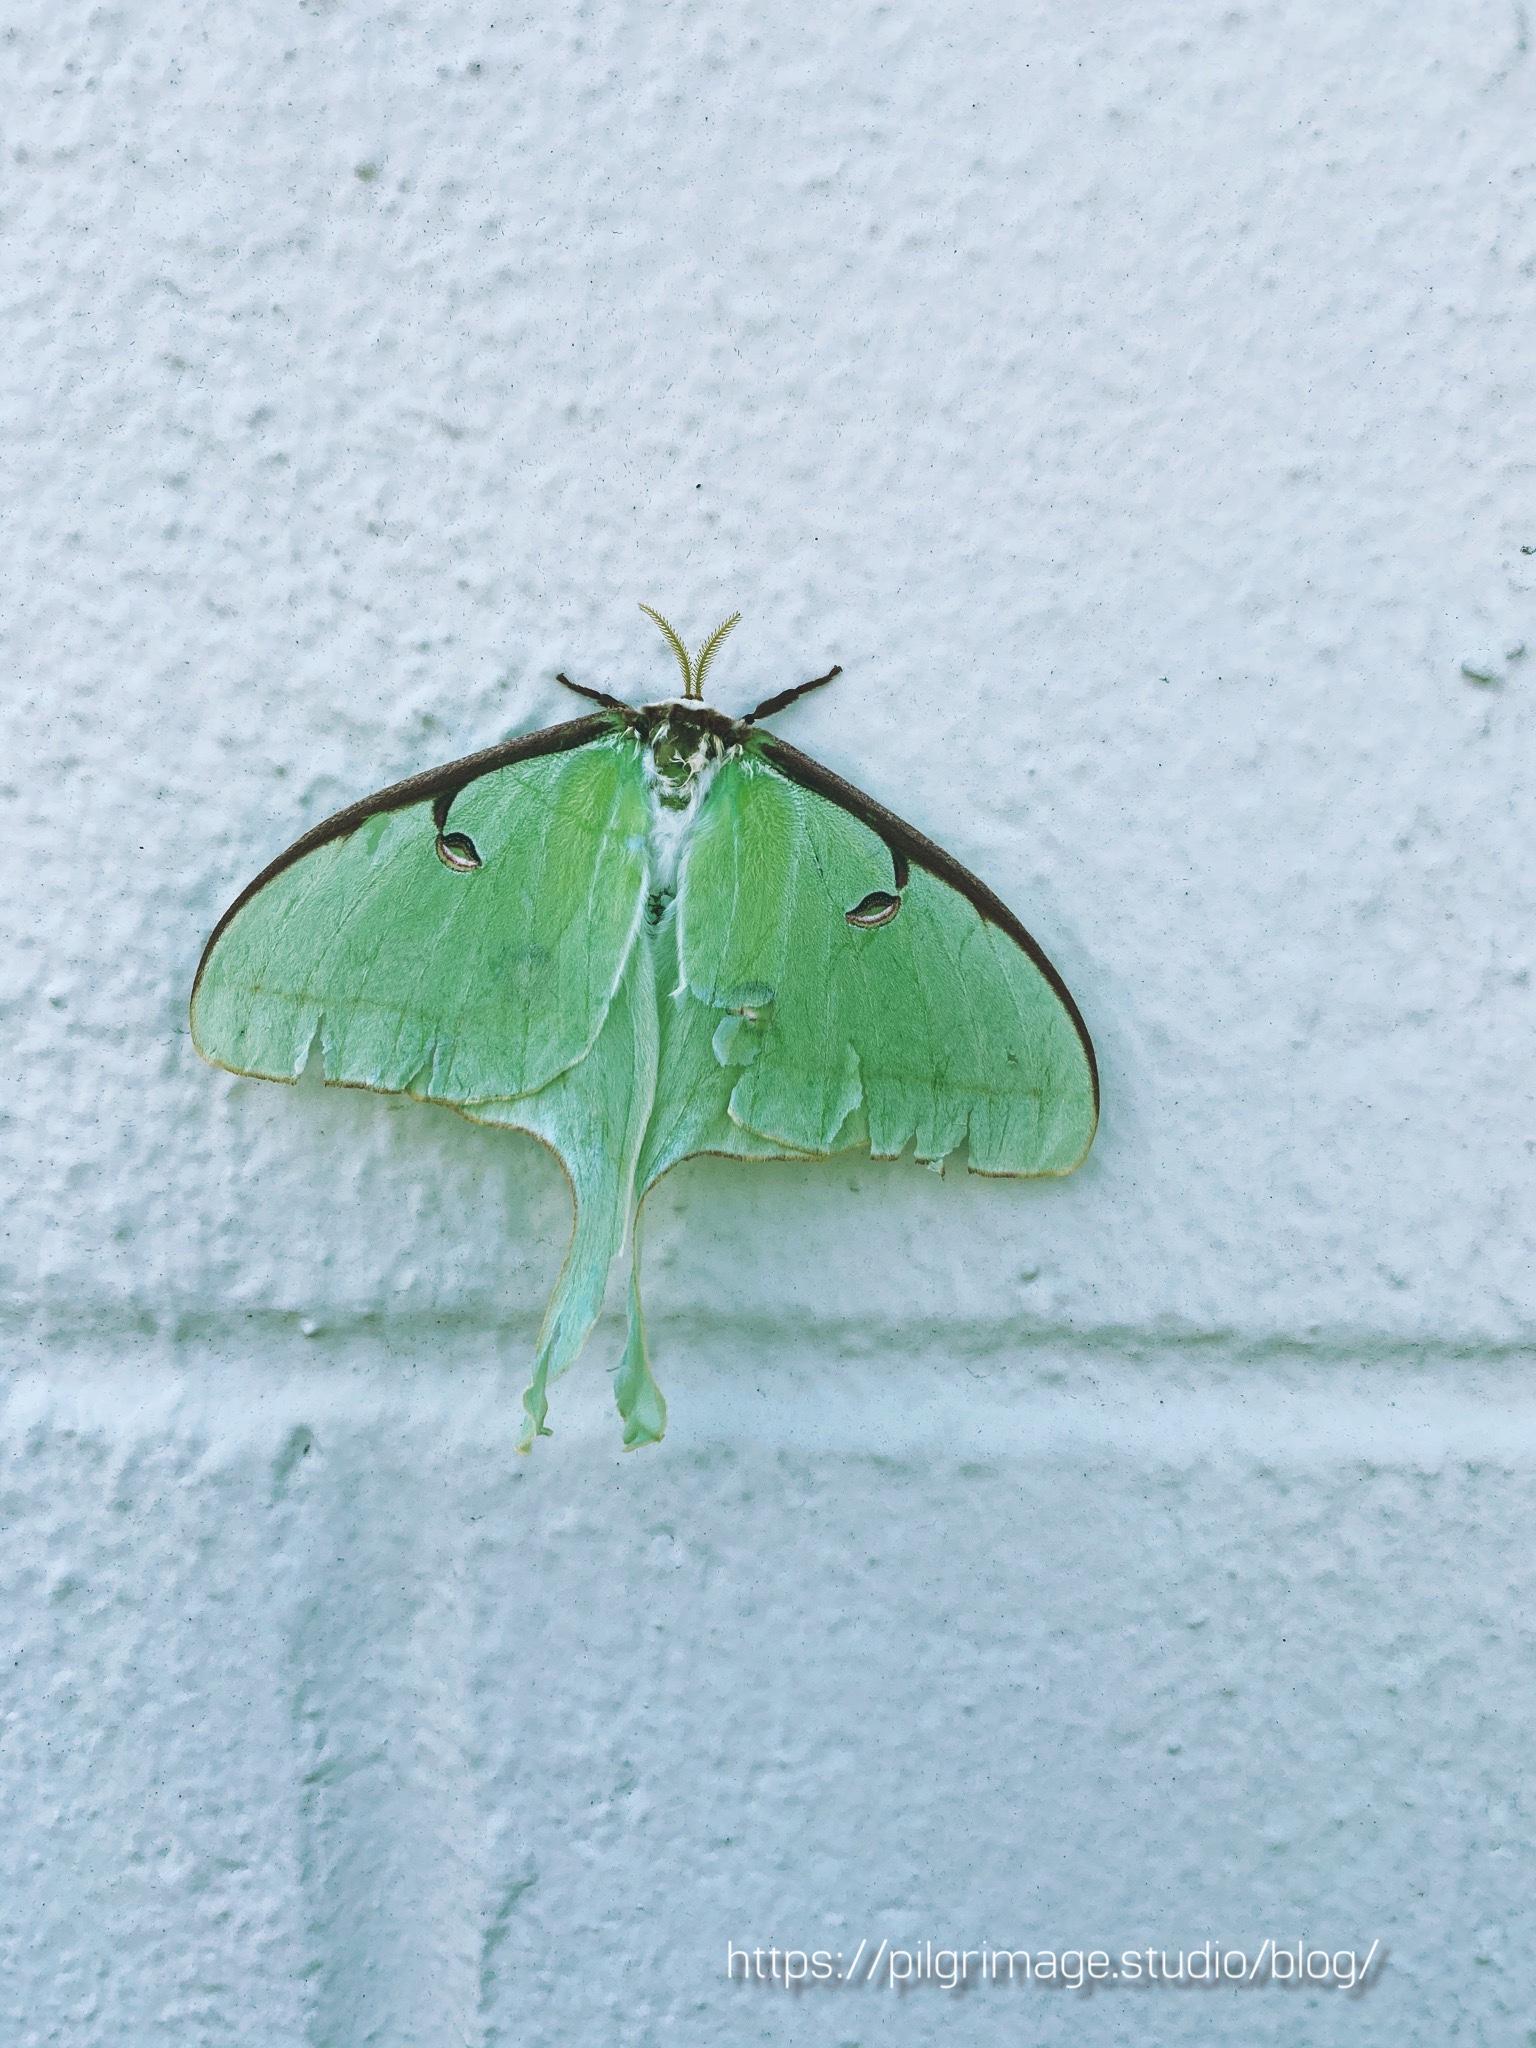 Large Luna moth